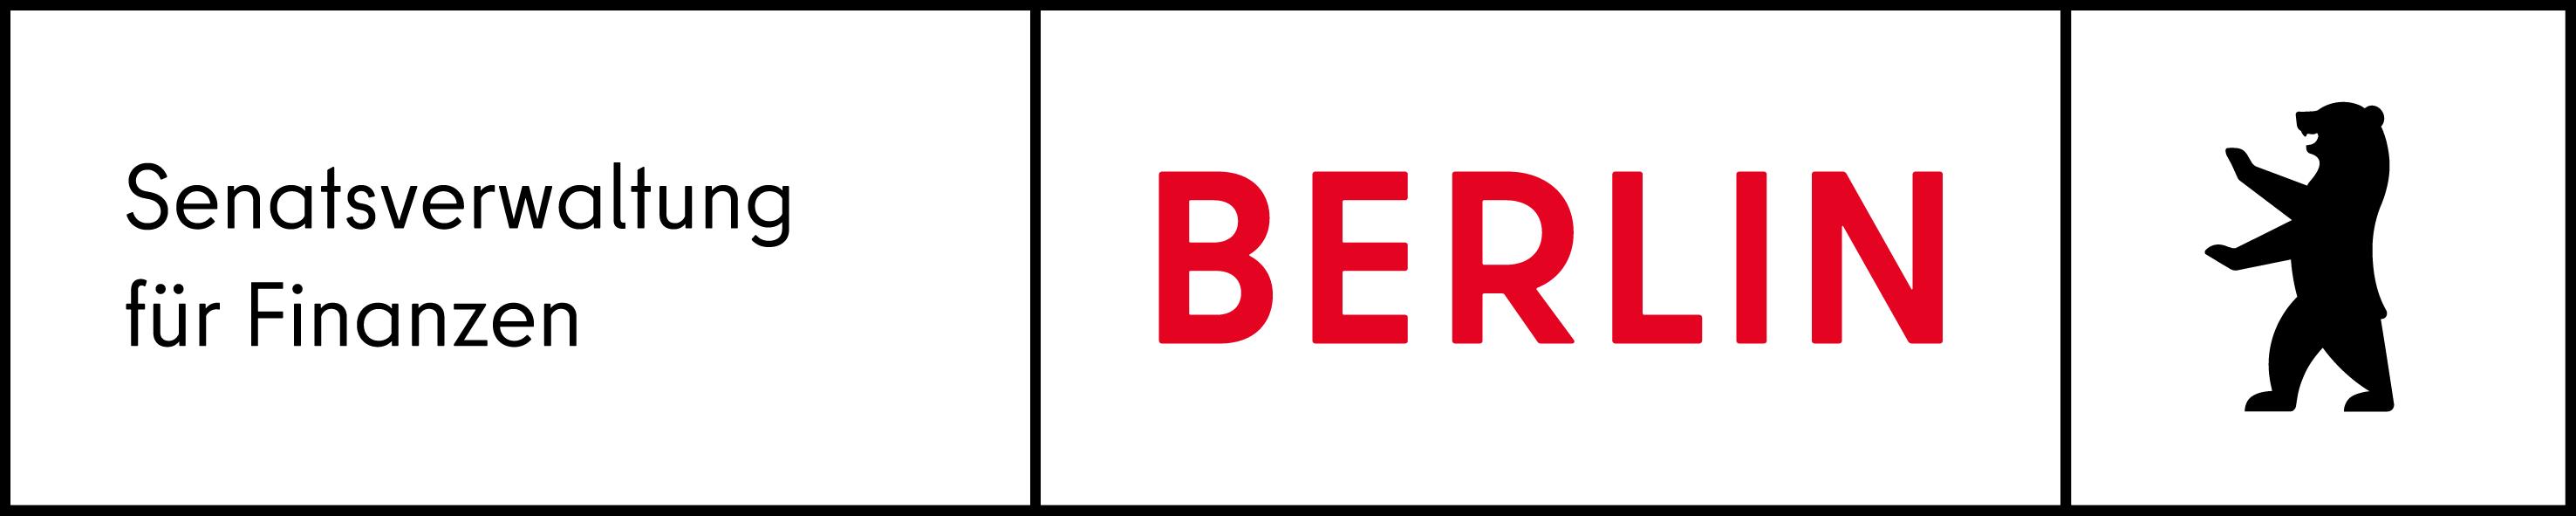 Stuzubi Berlin Ausstellerliste 9